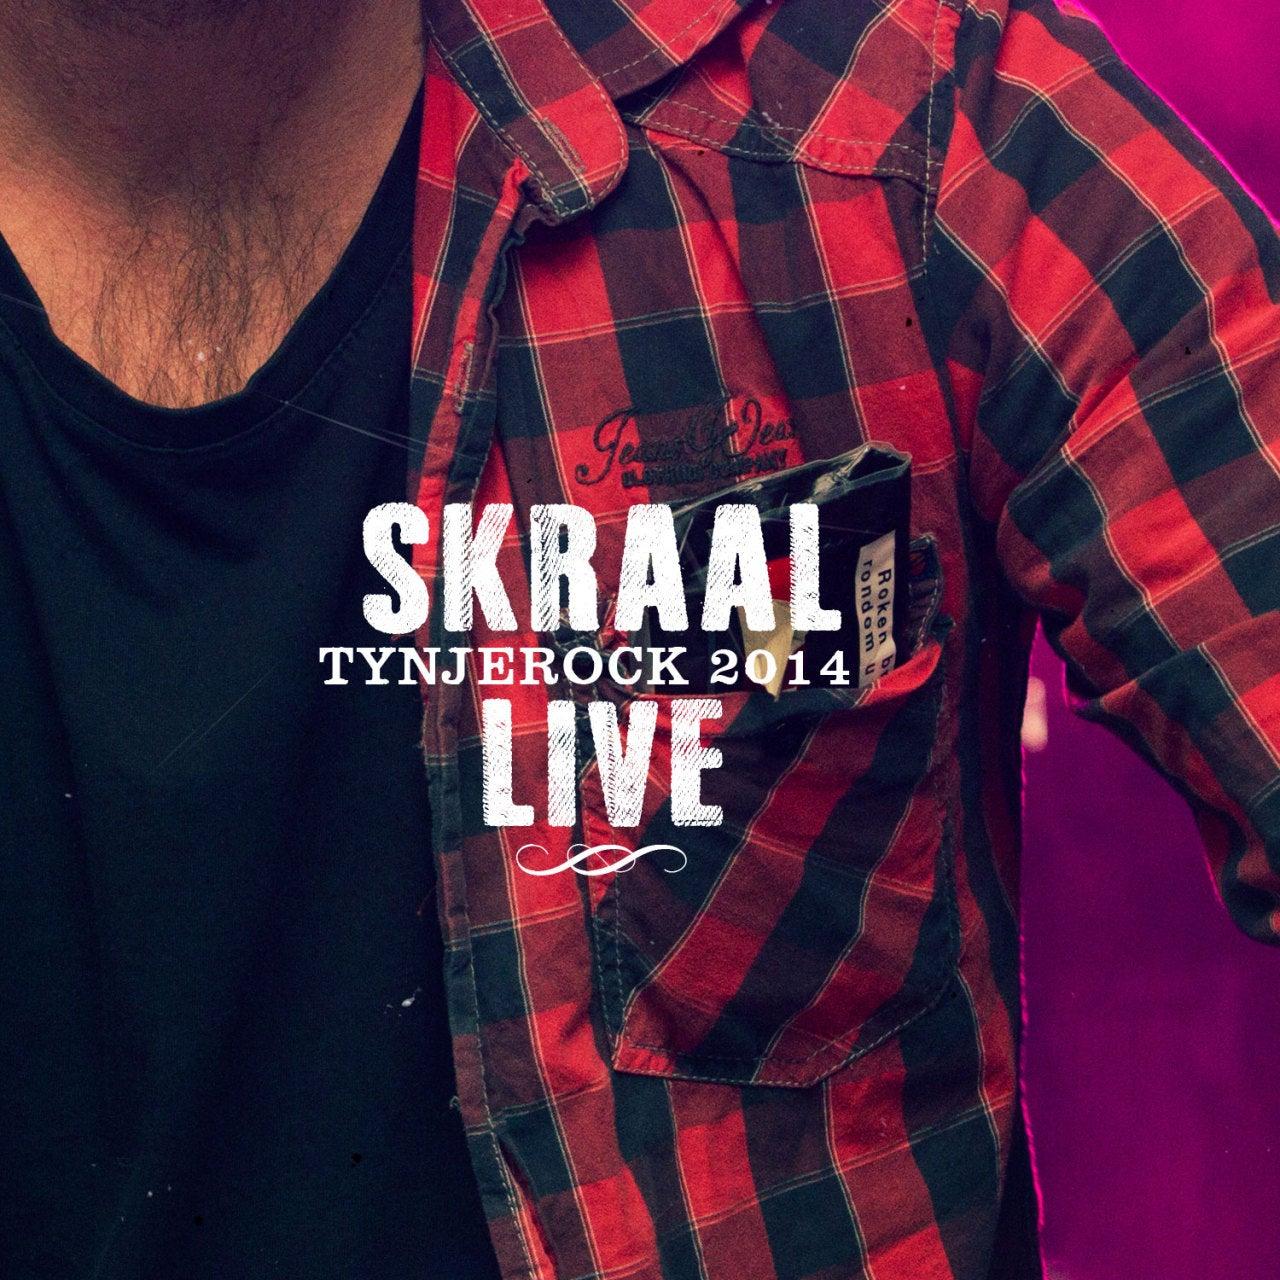 Image of Skraal Live 2014